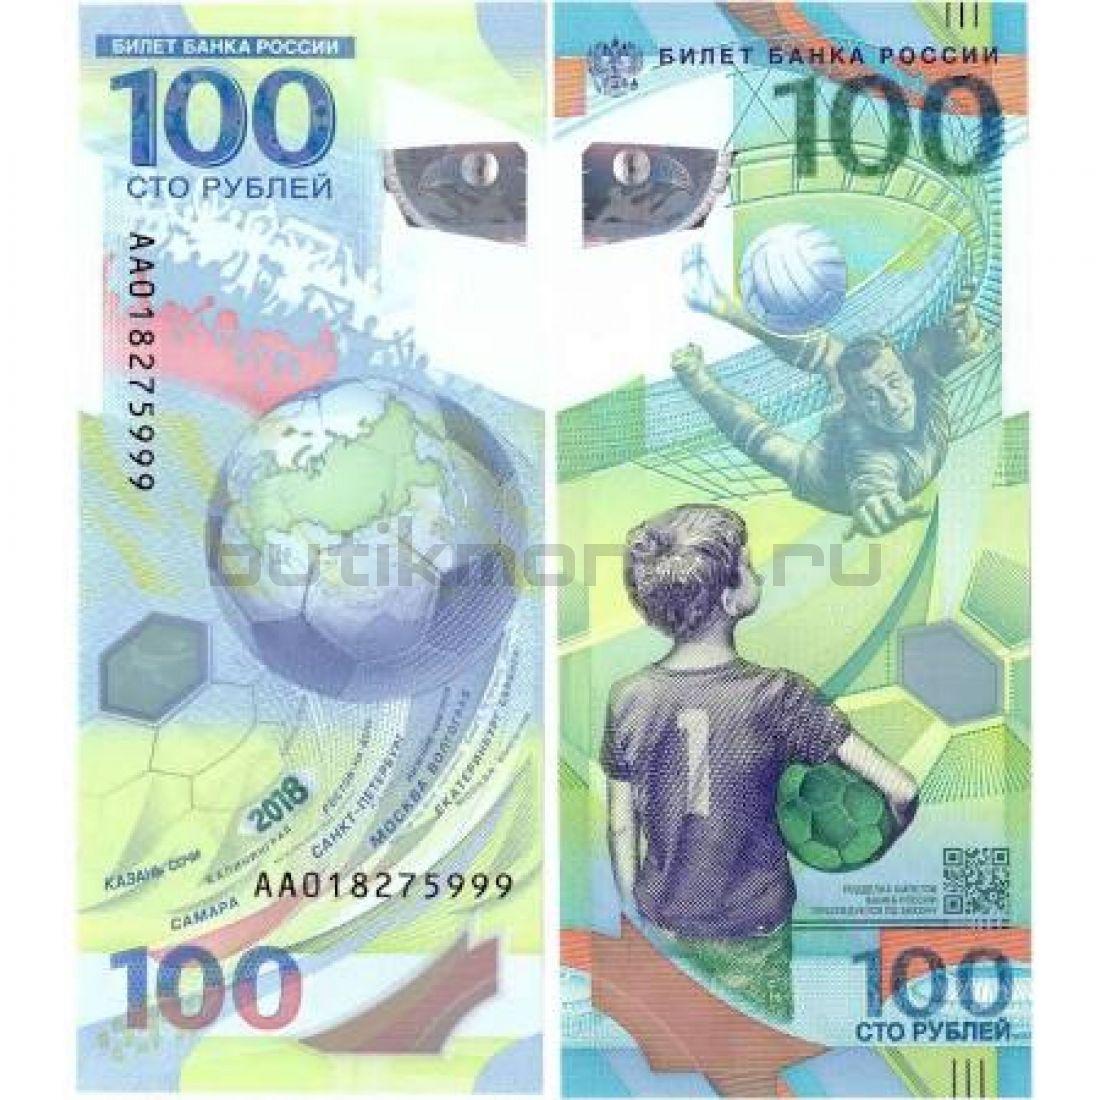 100 рублей 2018 Чемпионат мира по футболу (Серия АА)